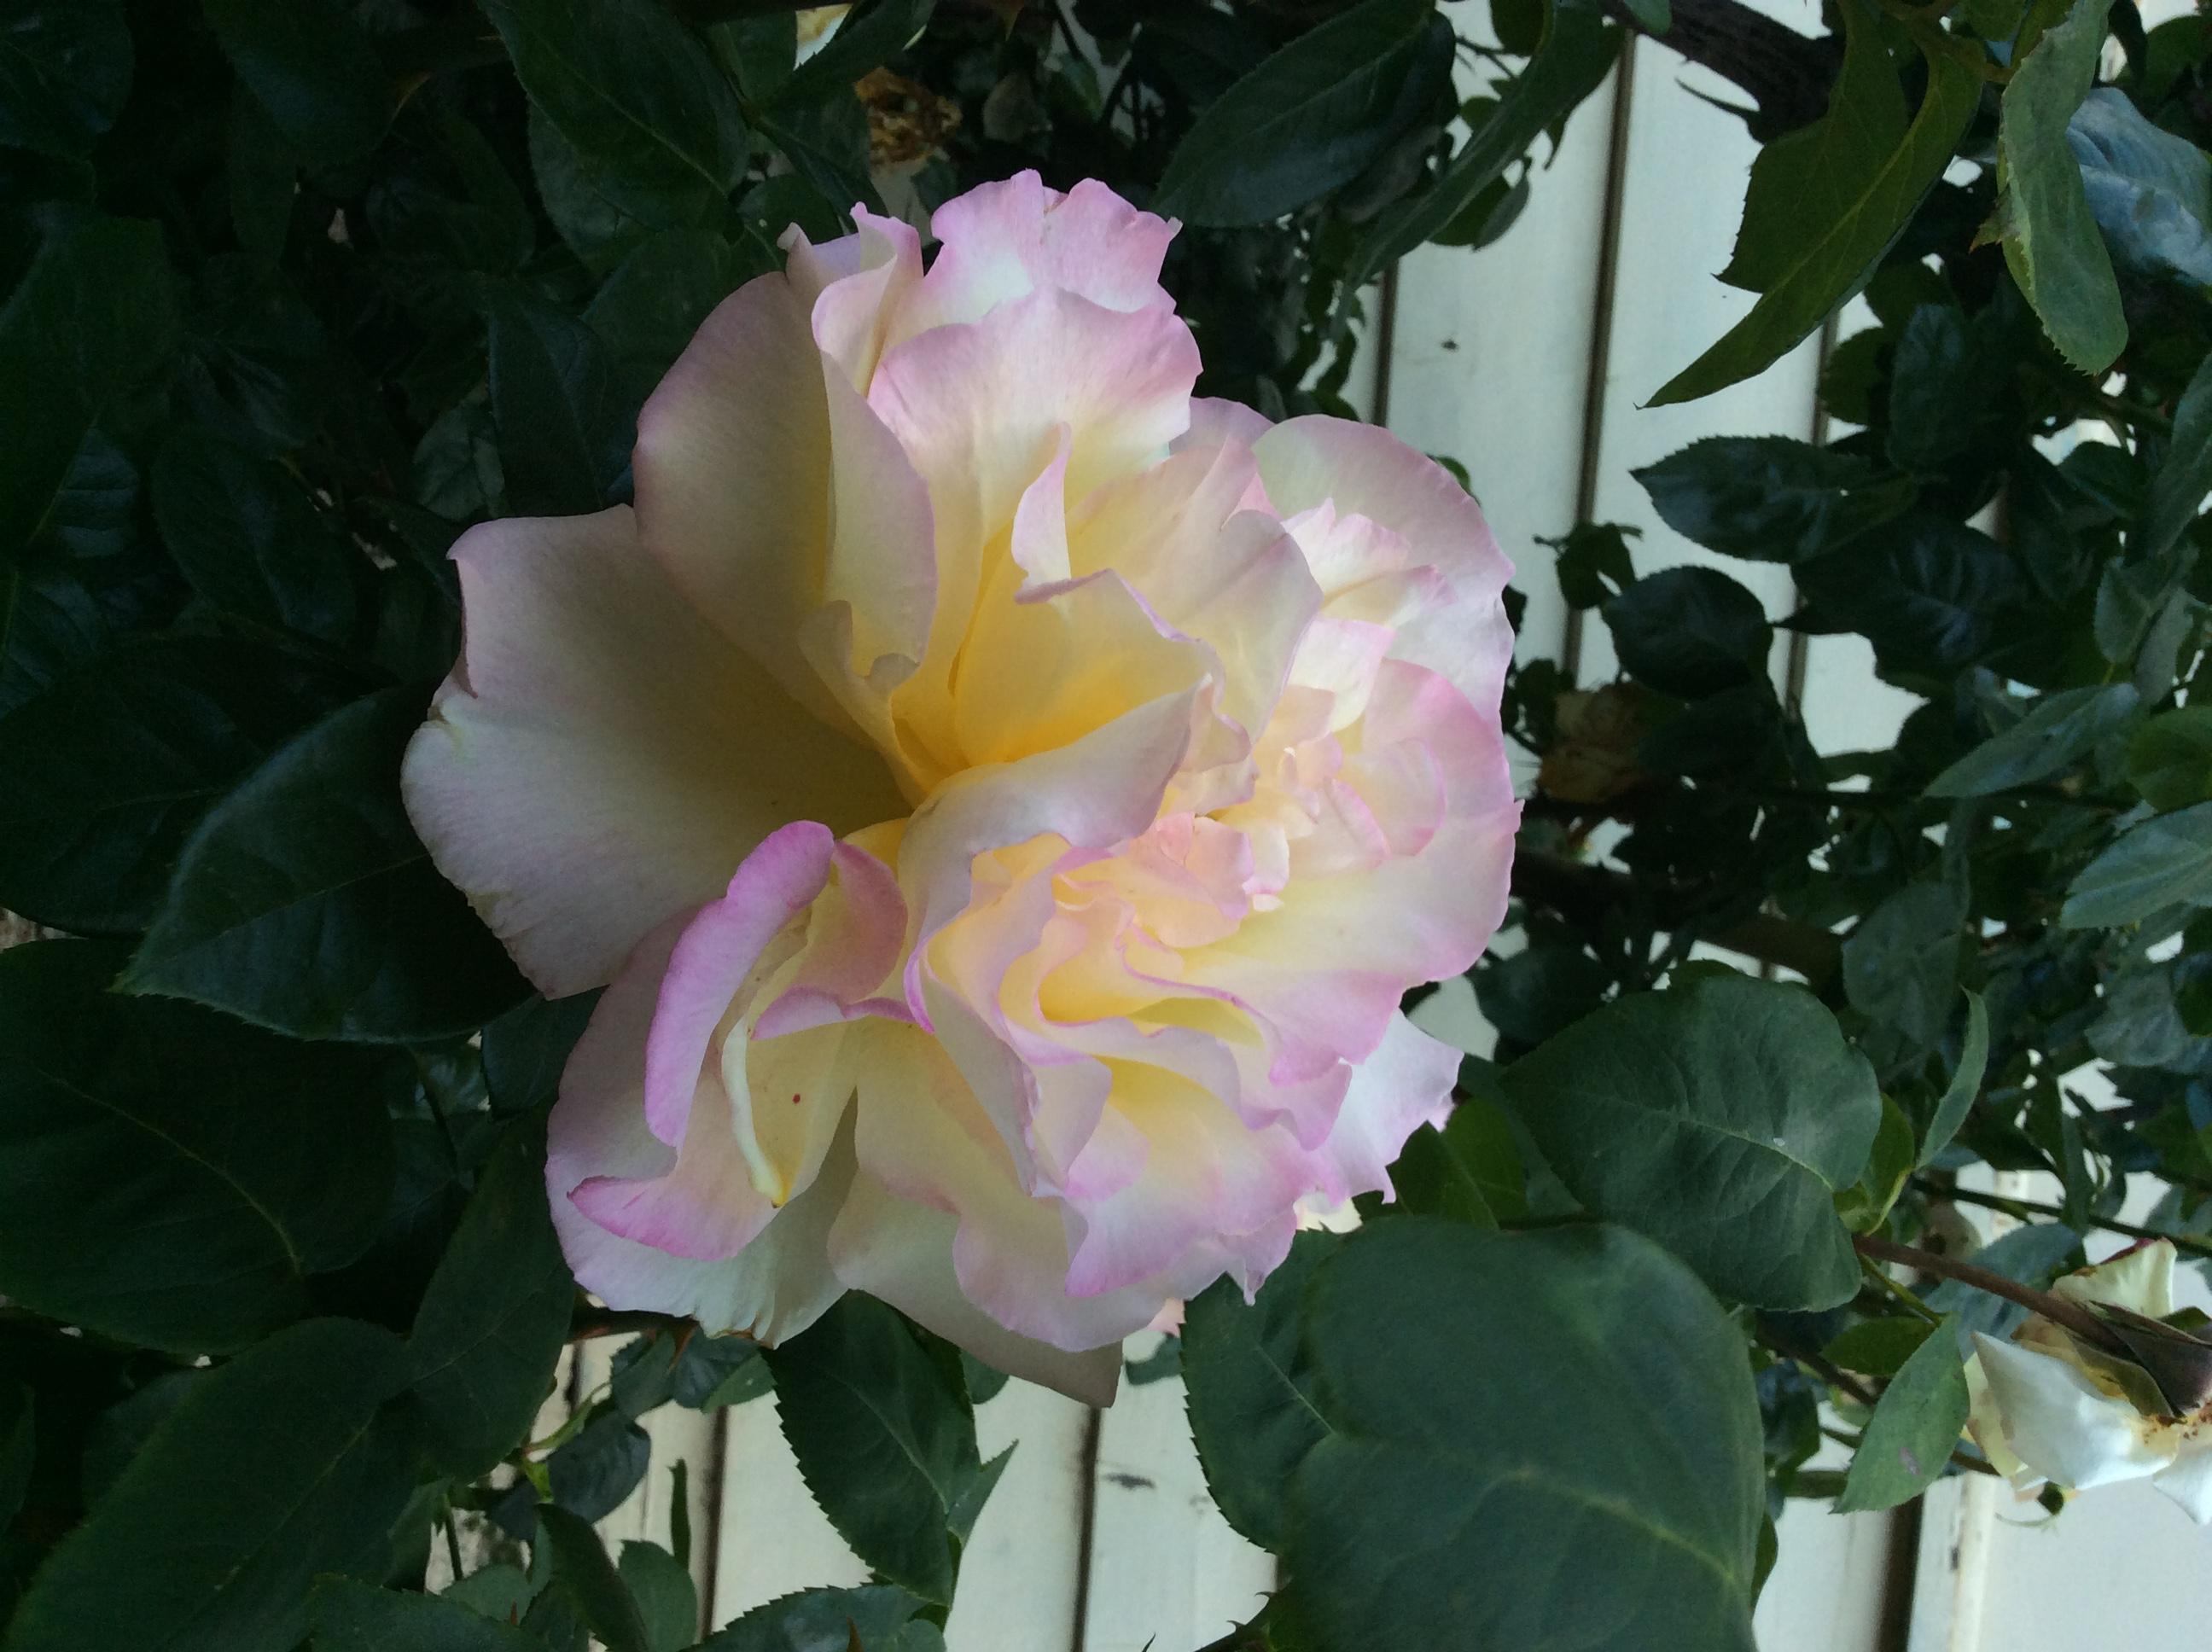 My photo a rose